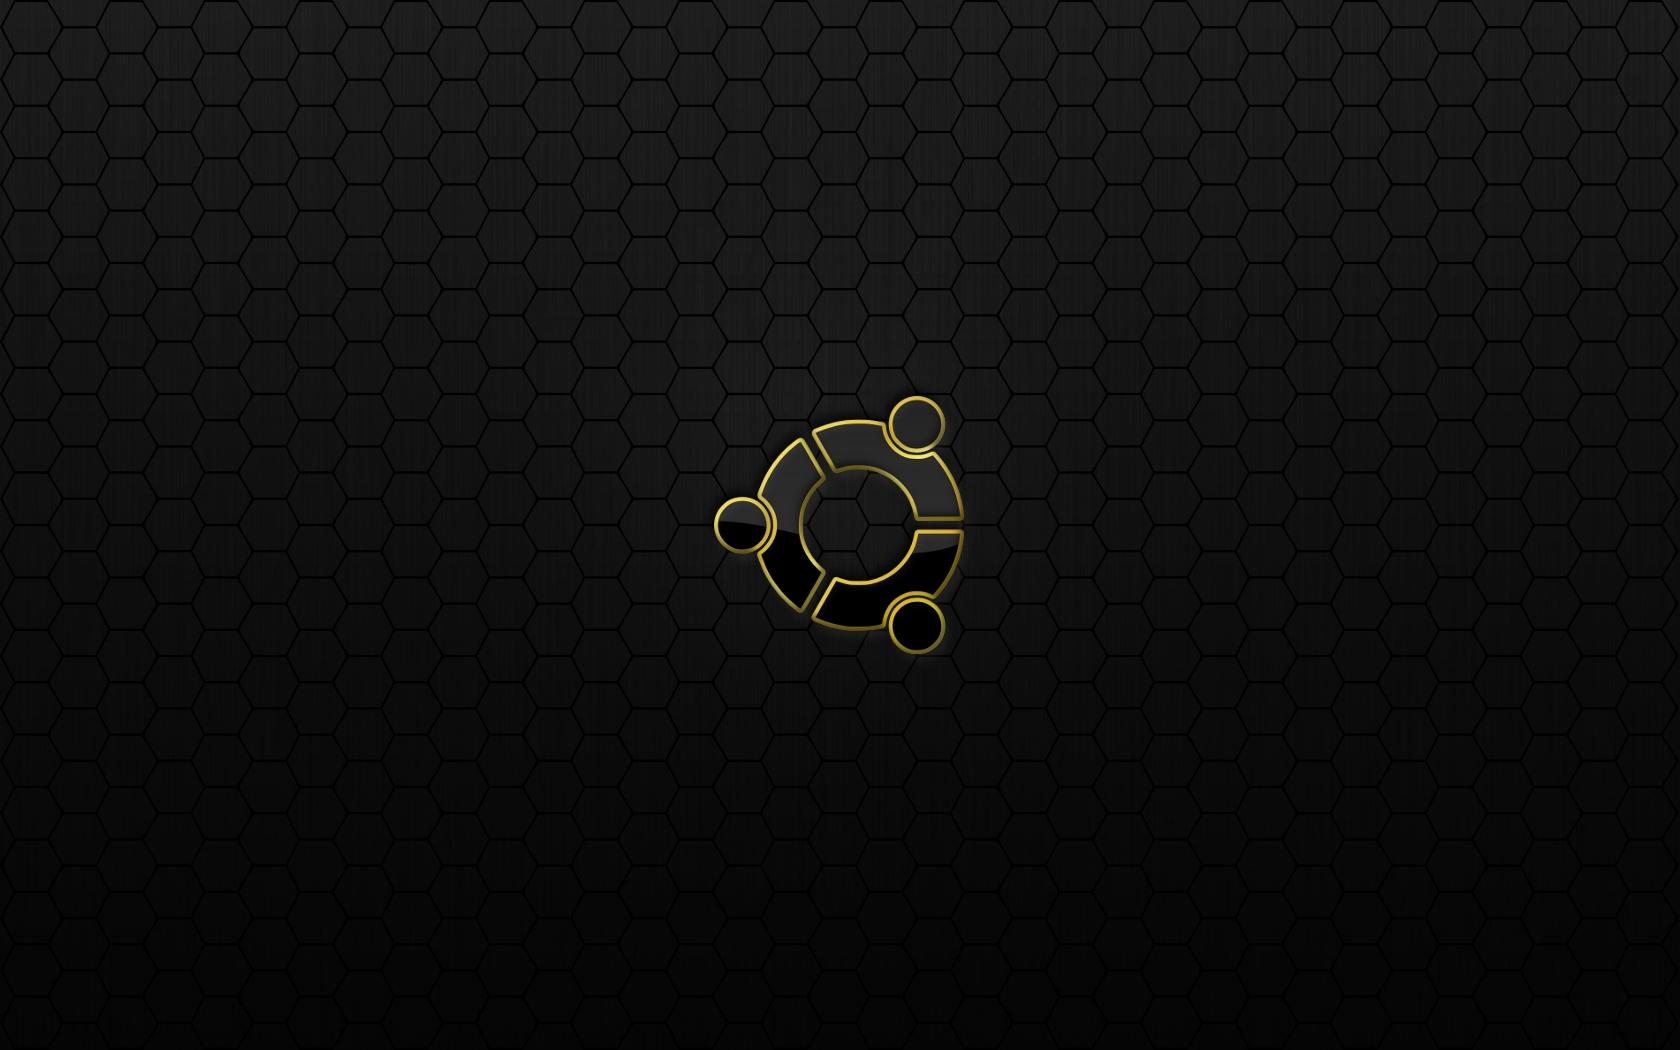 Turbubuntu Fondos de pantalla negros 1680x1050